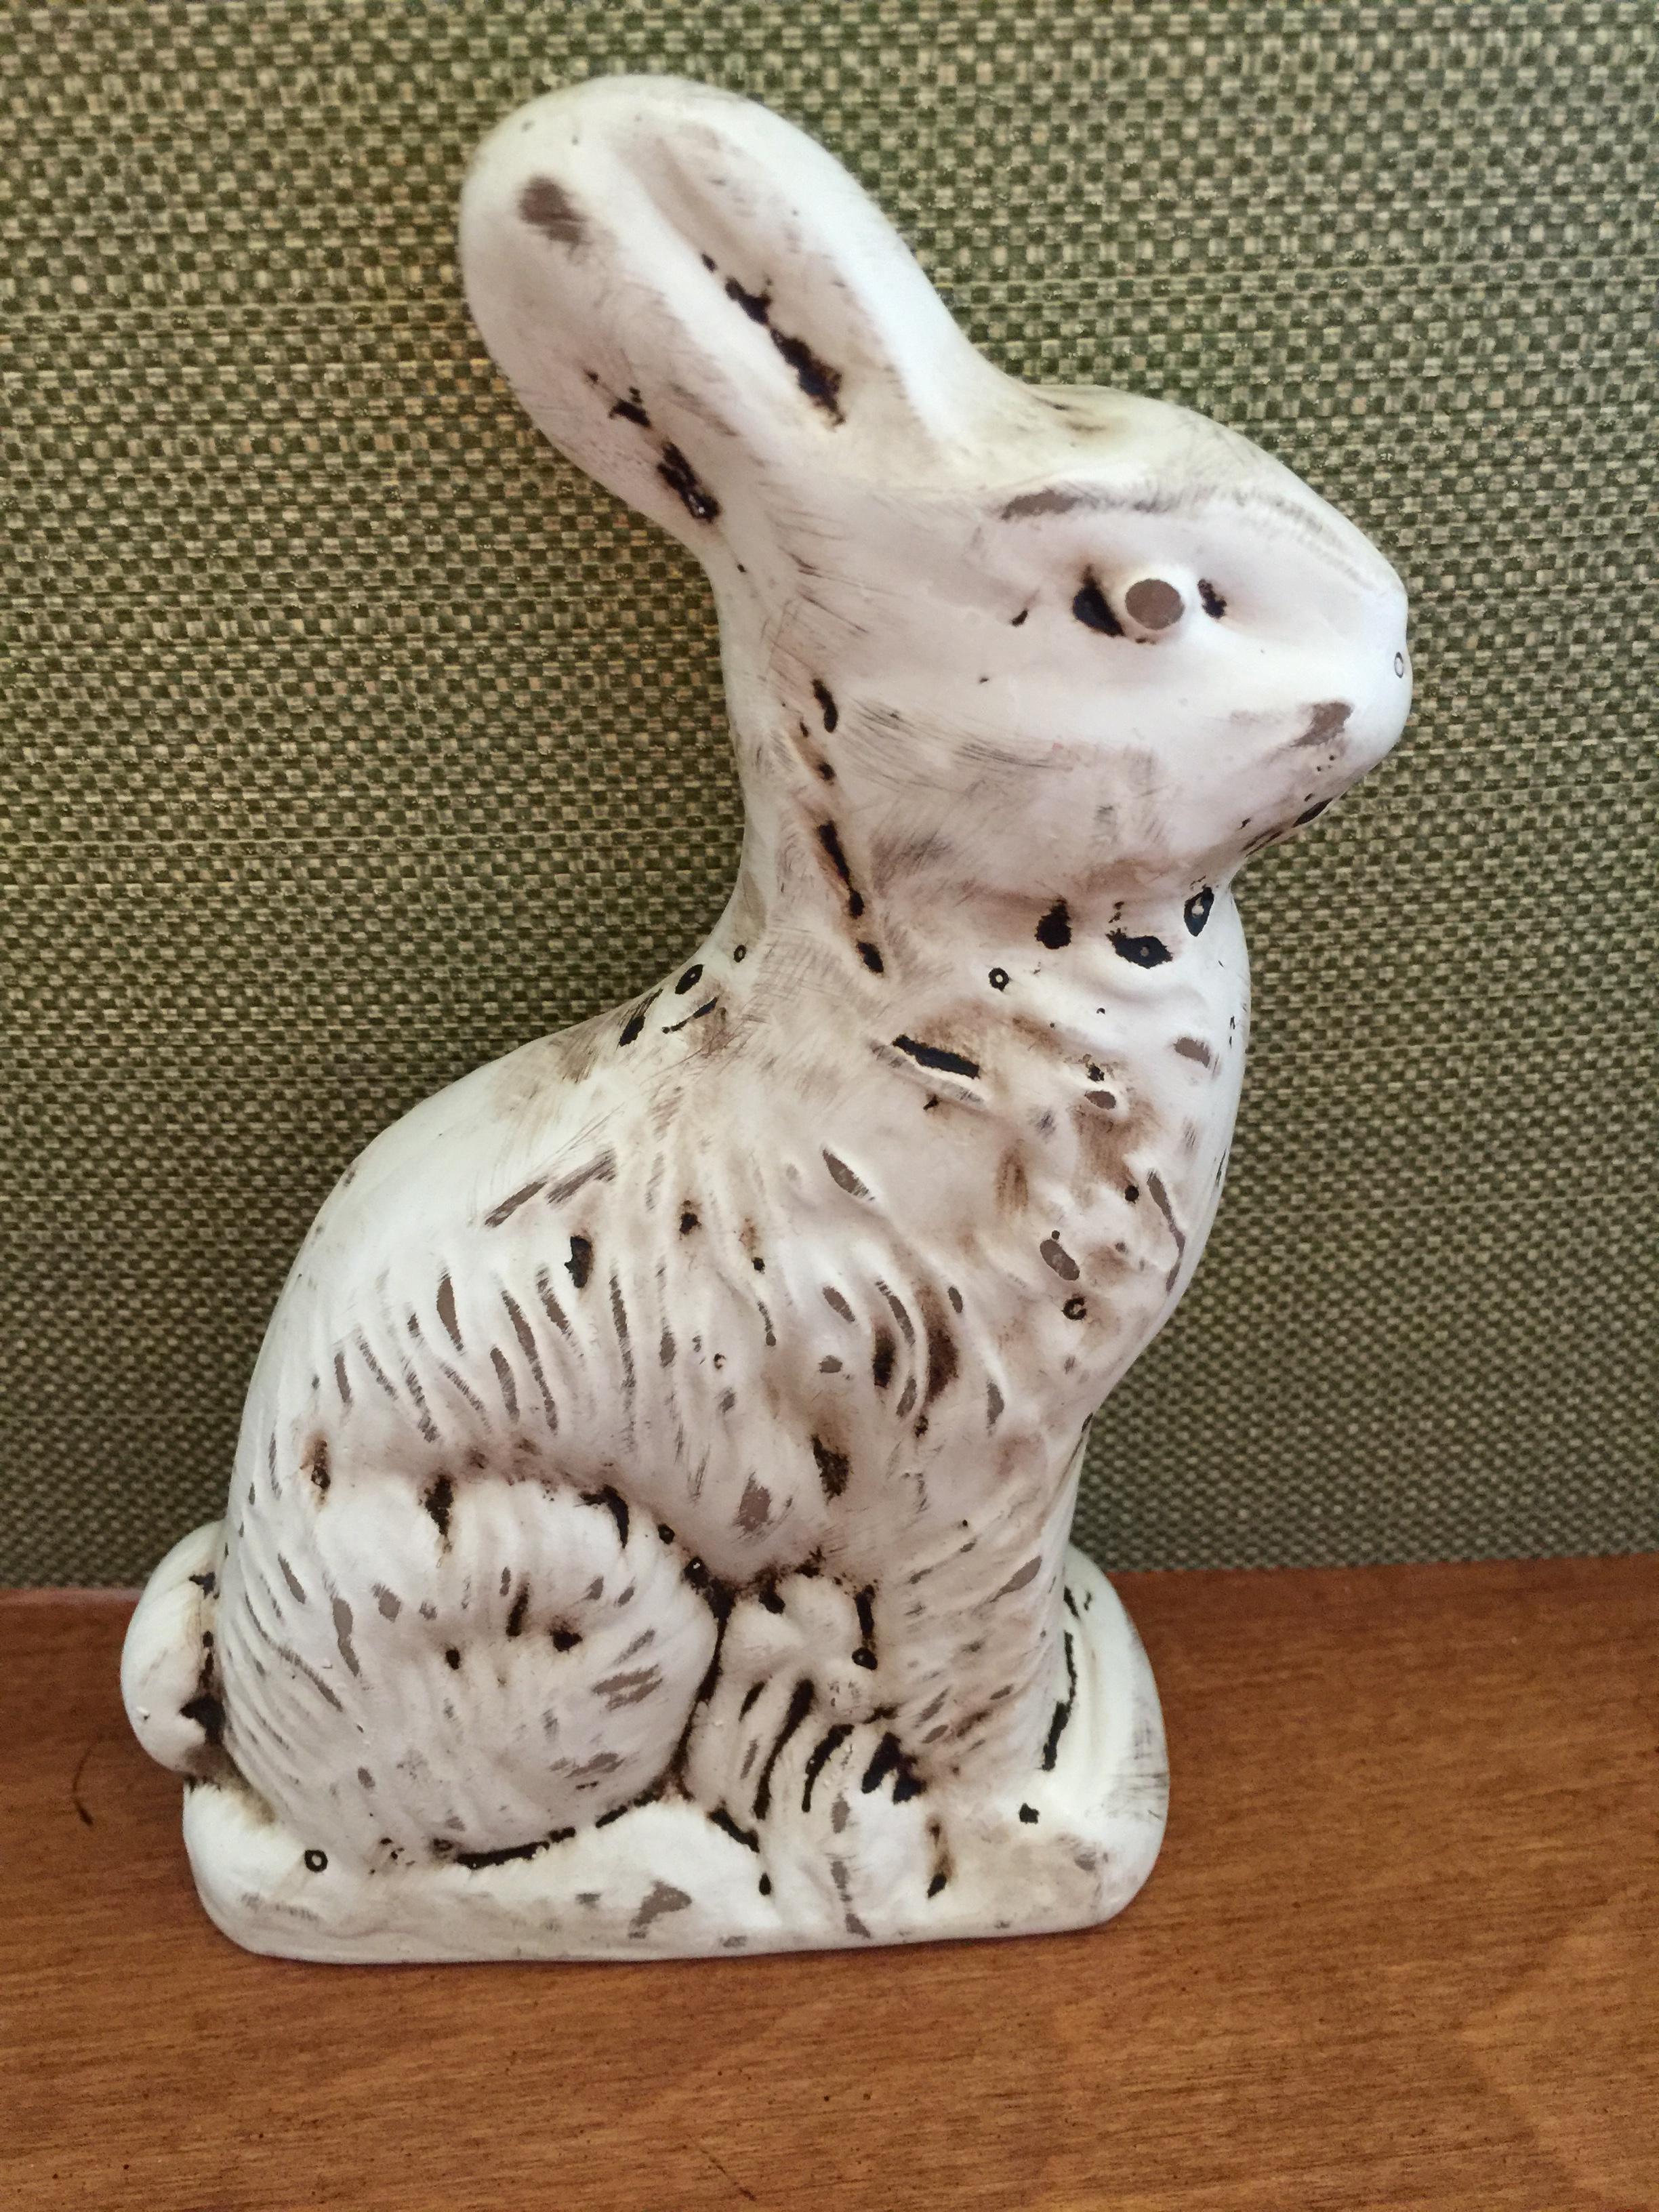 A small bunny figurine